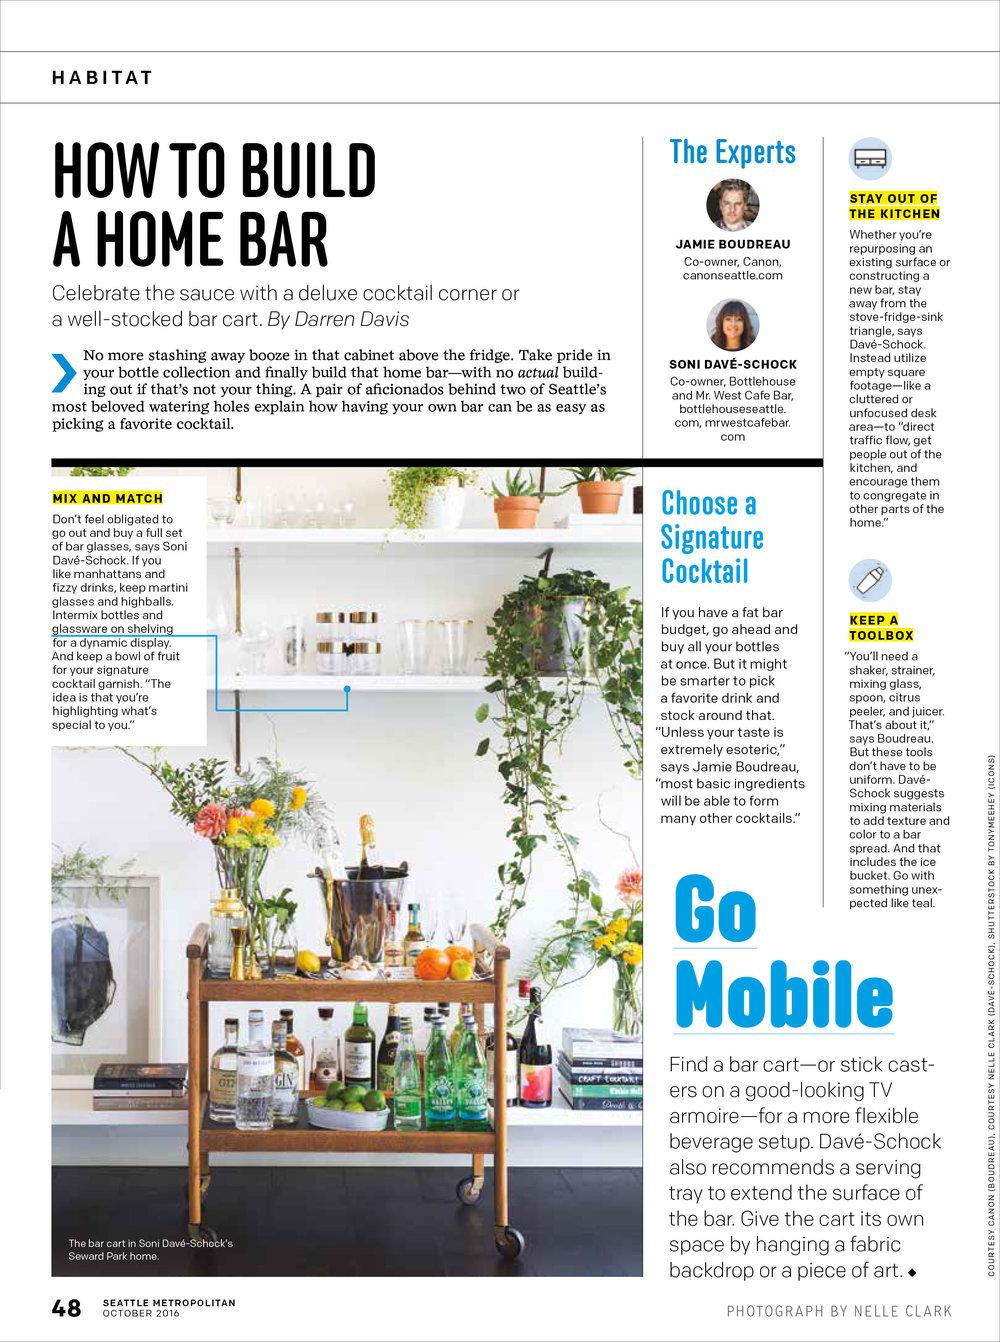 Seattle Met Habitat How to Build a Home Bar Cart